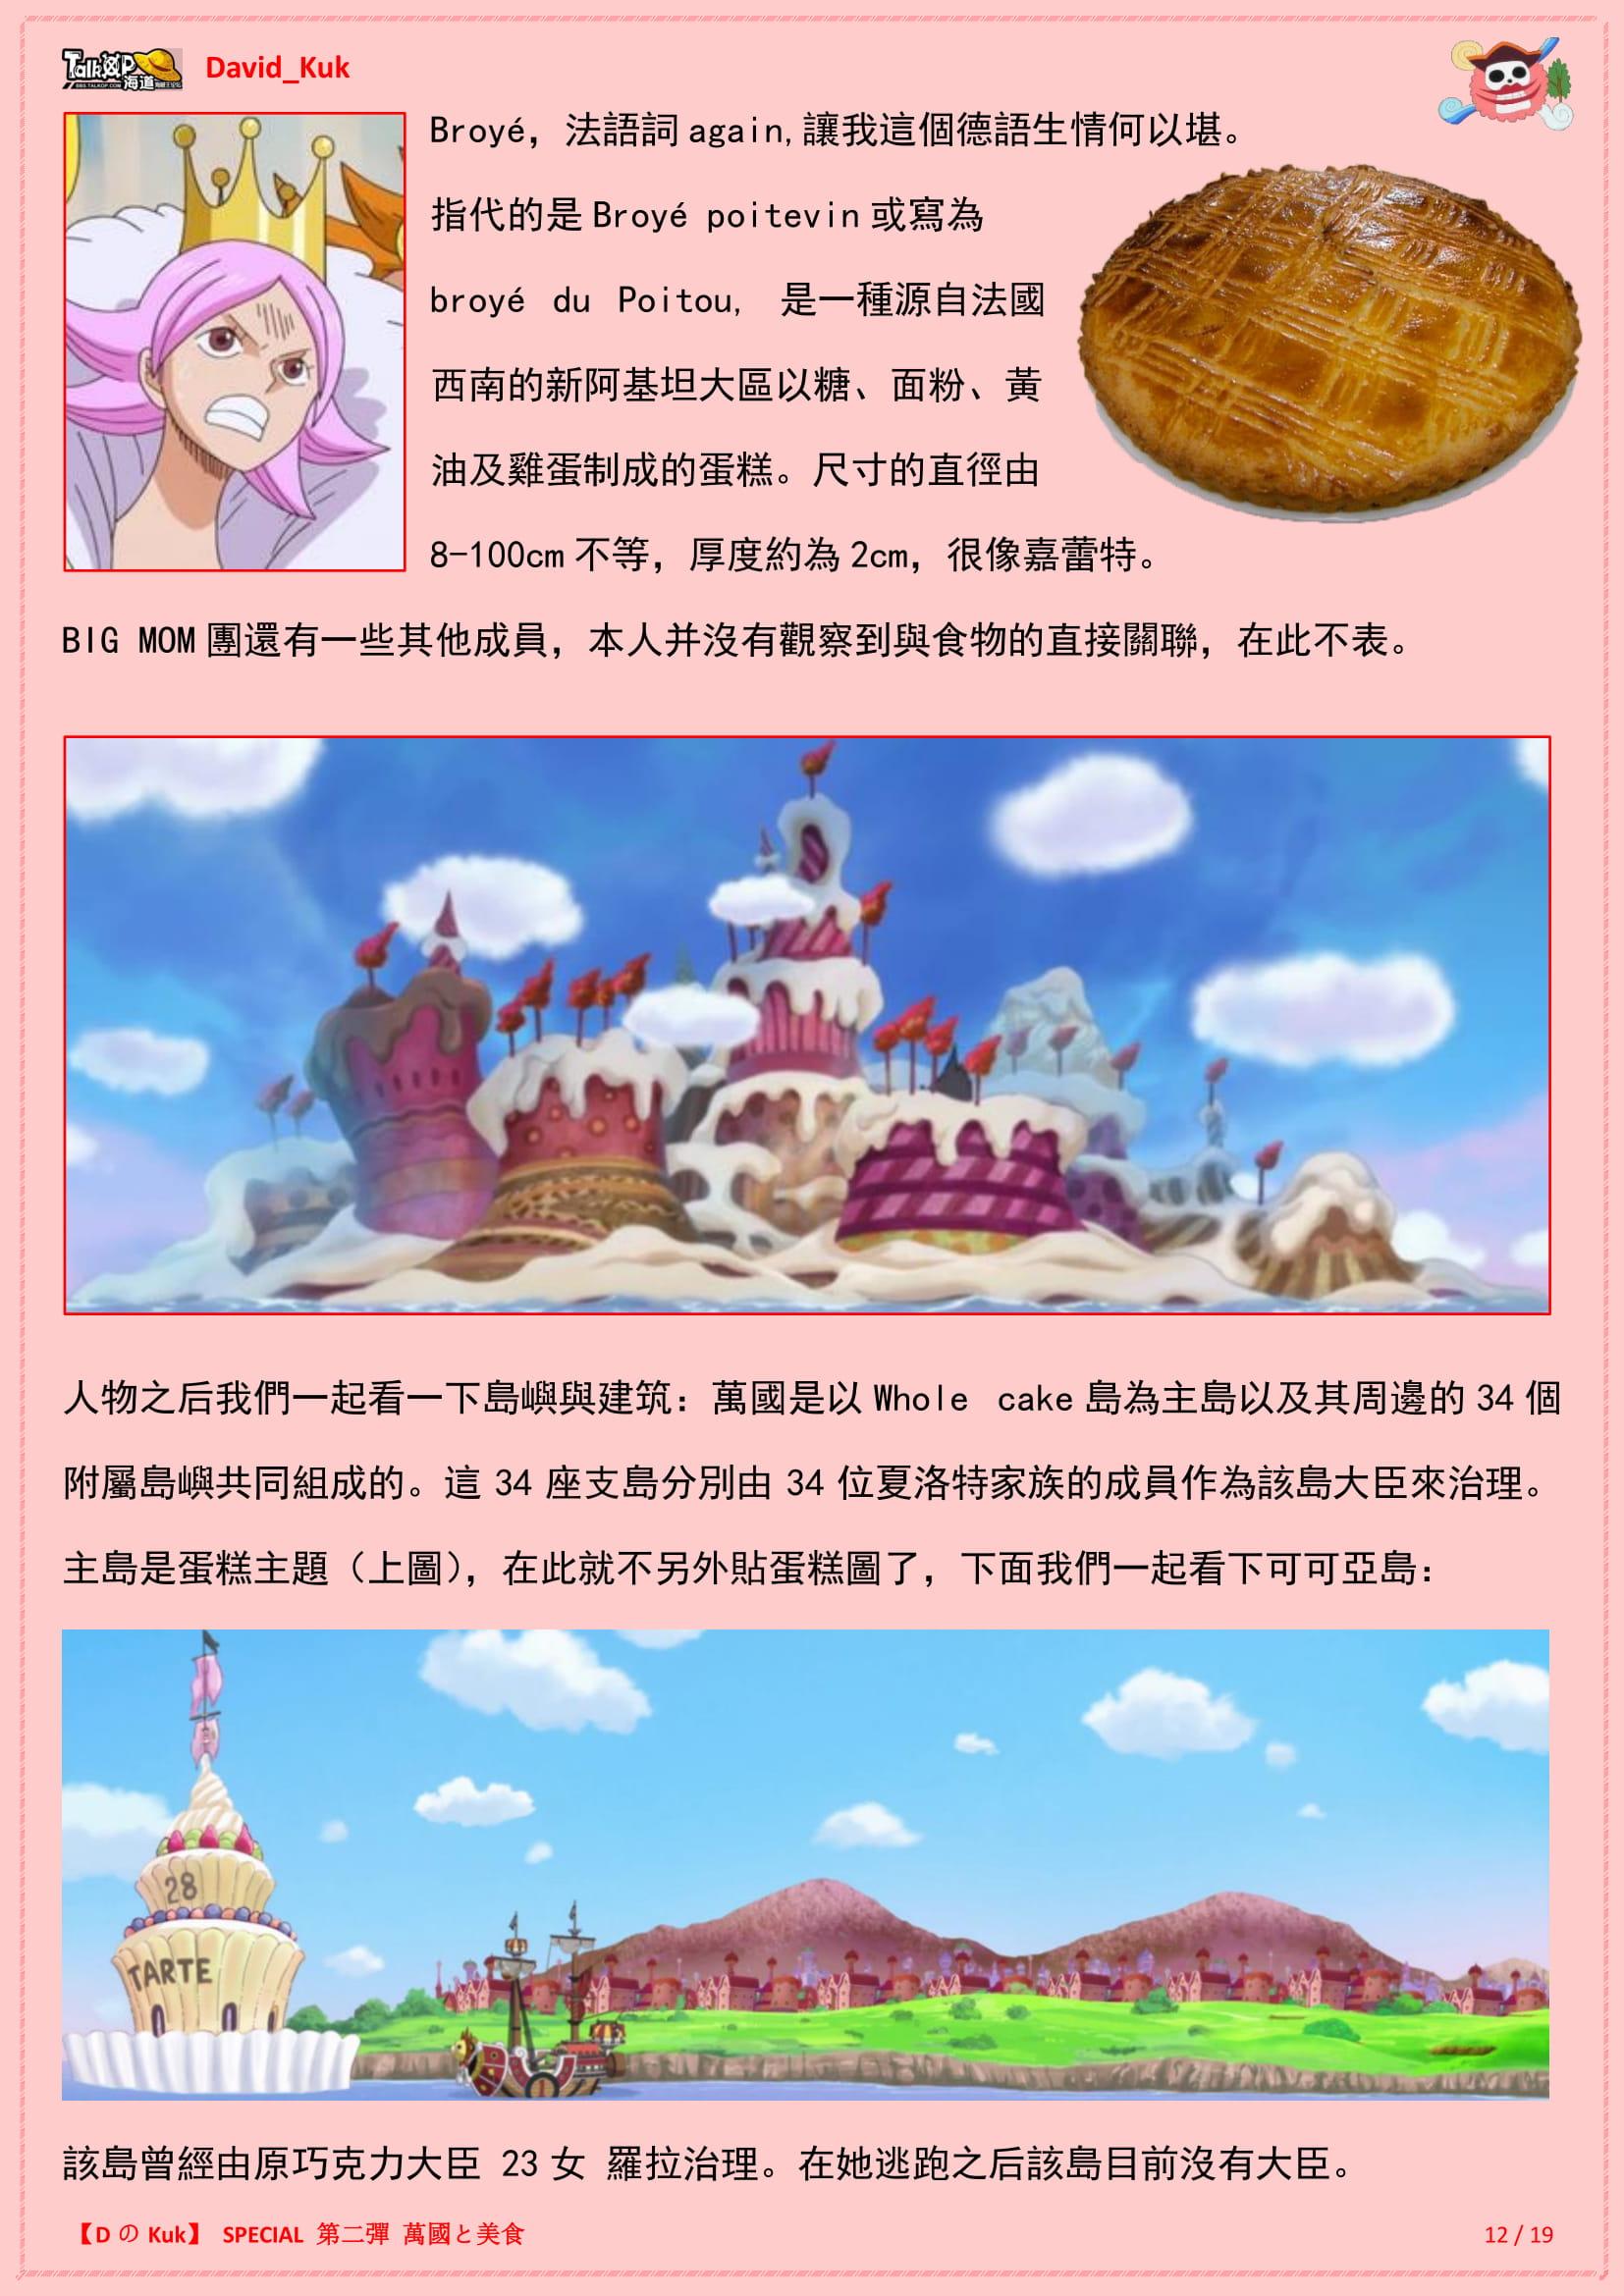 【DのKuk】 SPECIAL 第二彈 萬國と美食-12.jpg